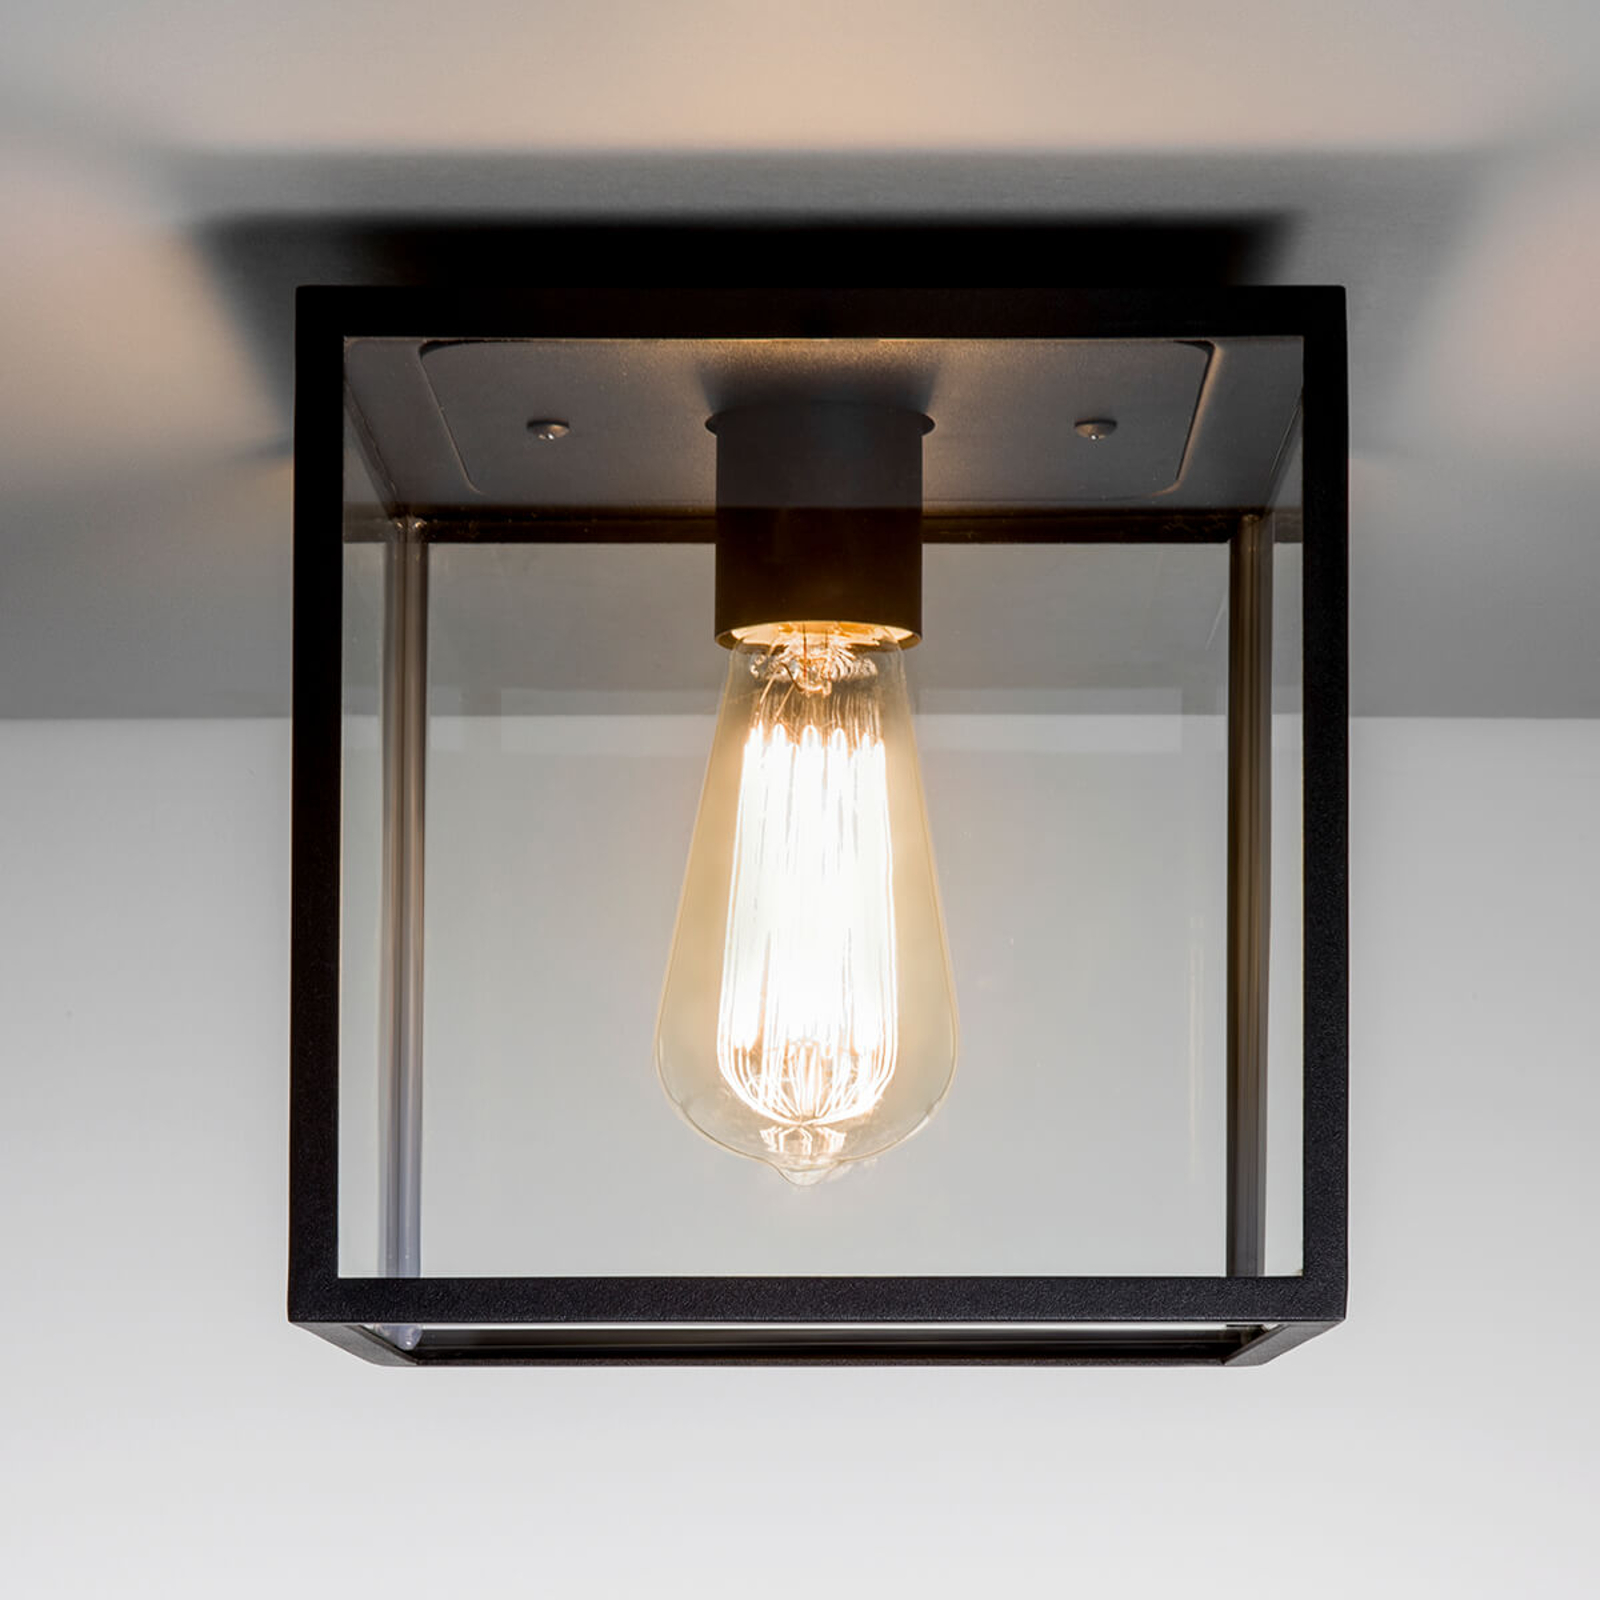 In de trendy vintage stijl - plafondlamp Box